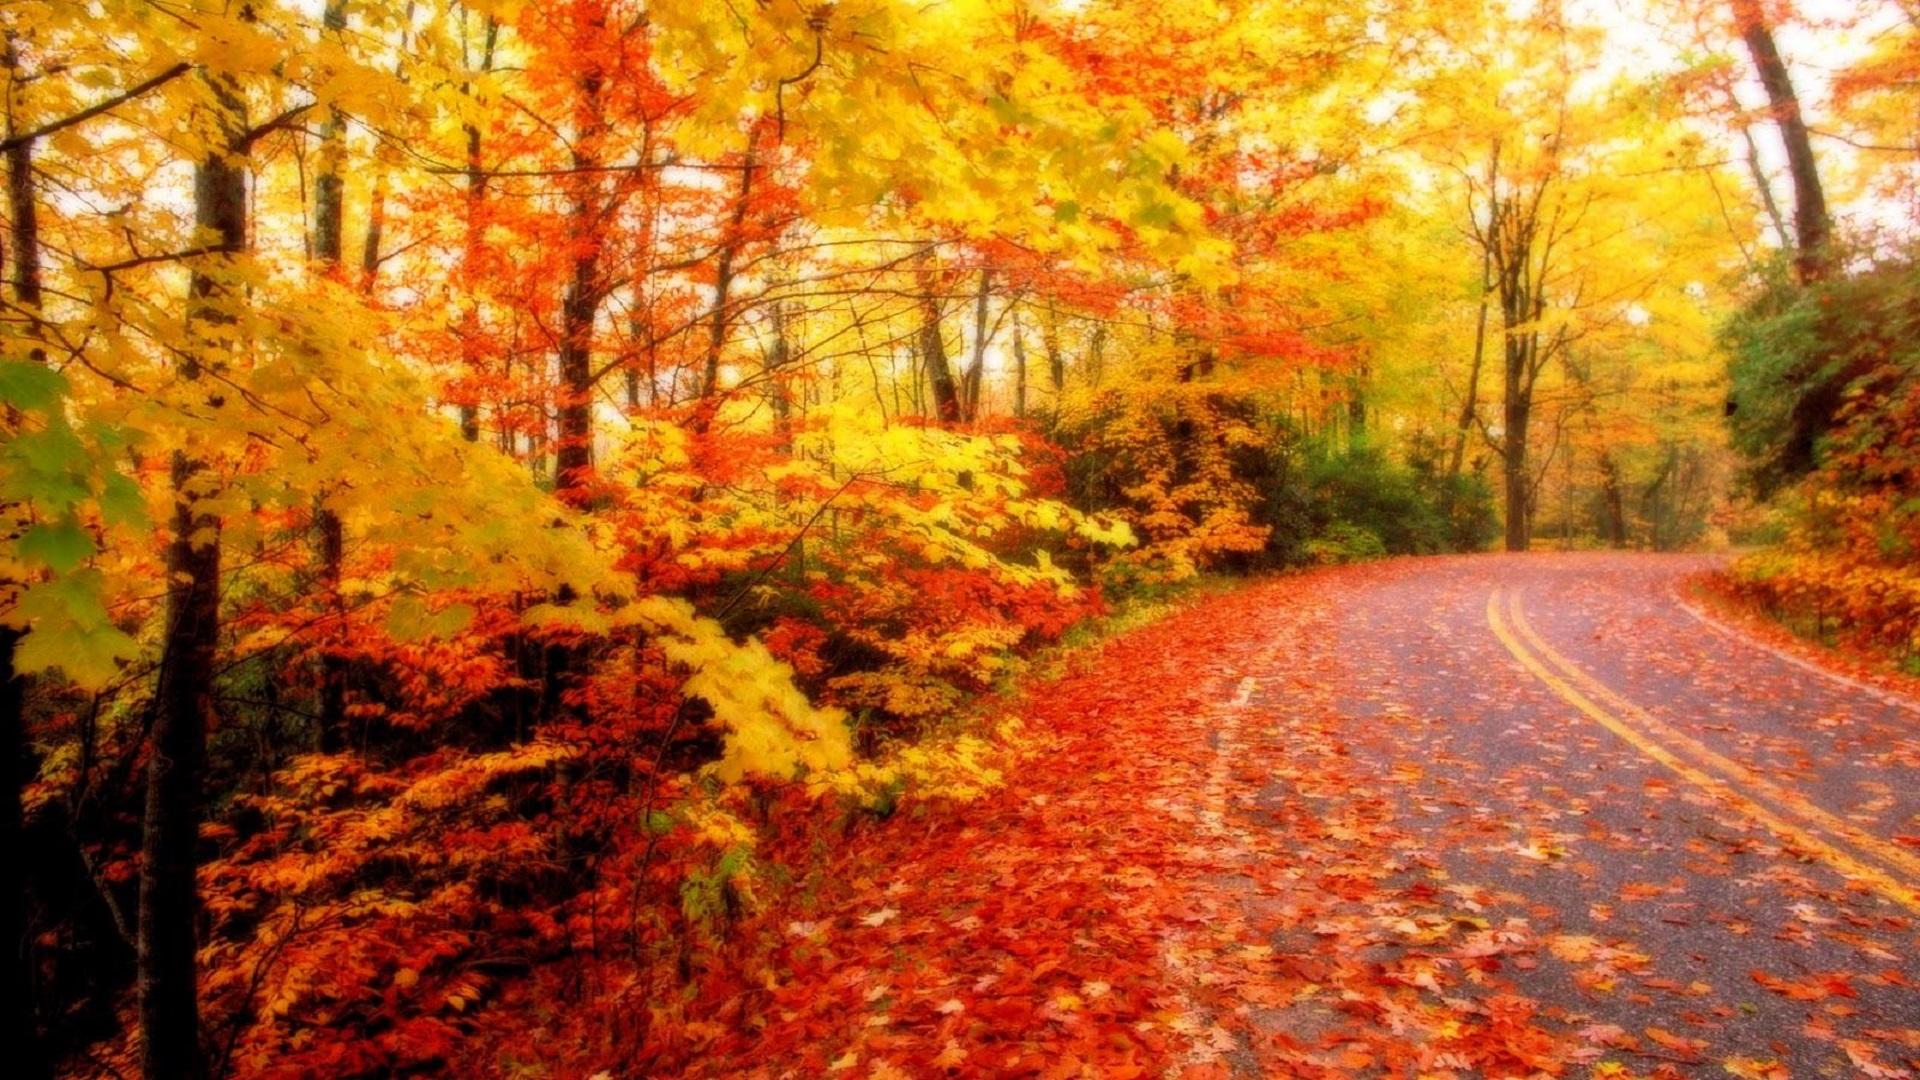 Beautiful Autumn Season Wallpapers HD 1600x1000 1920x1080